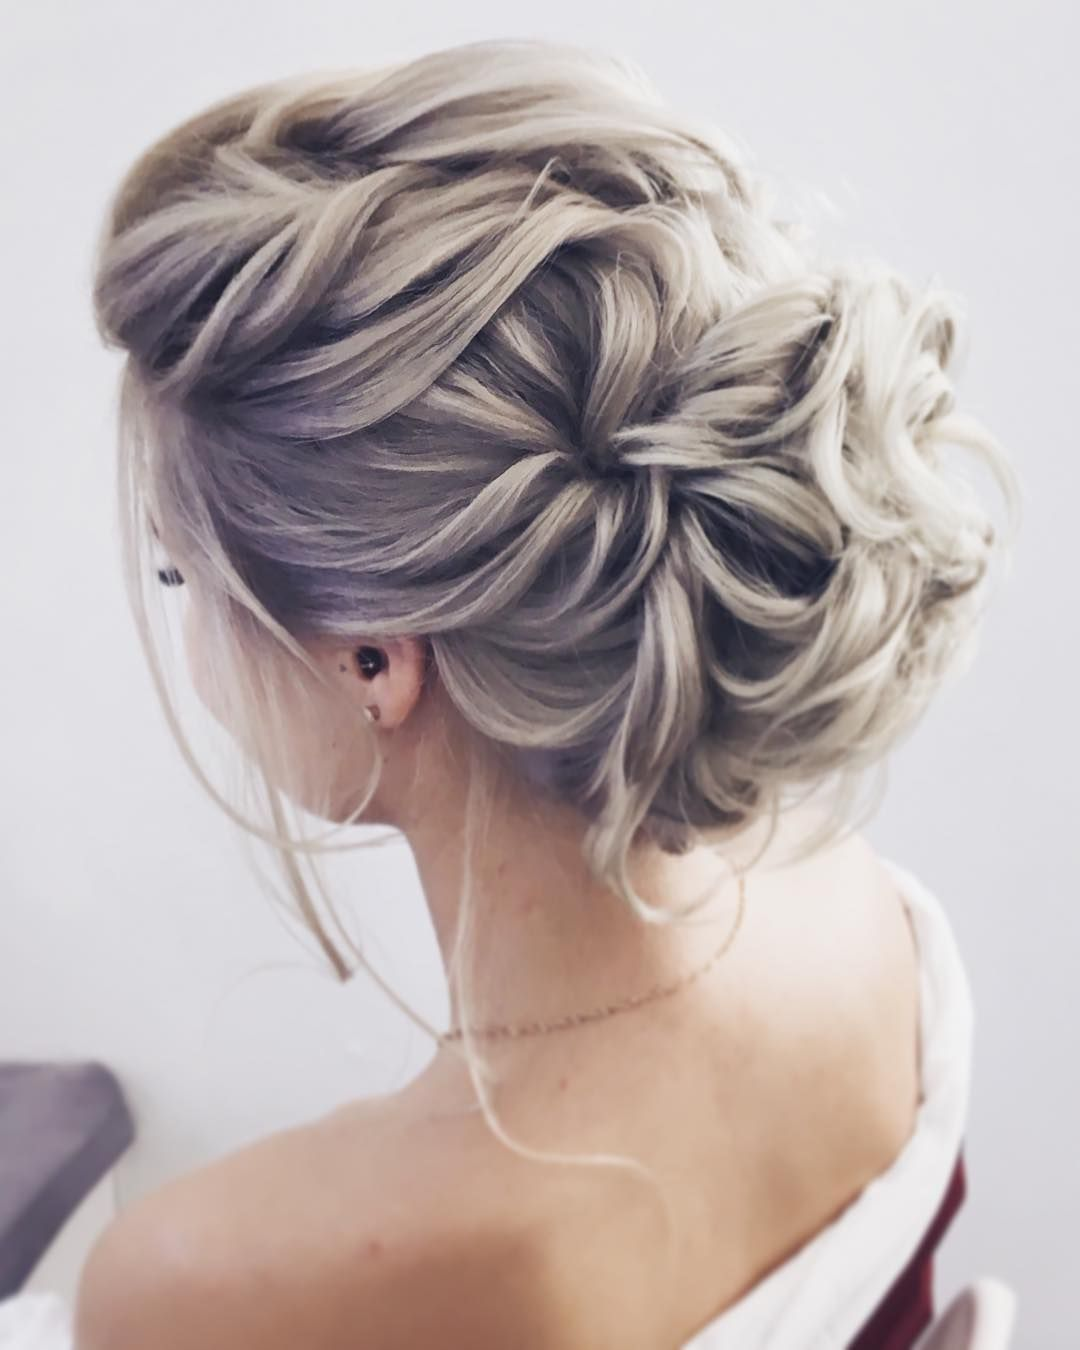 Gorgeous feminine wedding hairstyles for long hair penteados gorgeous feminine wedding hairstyles for long hair junglespirit Gallery